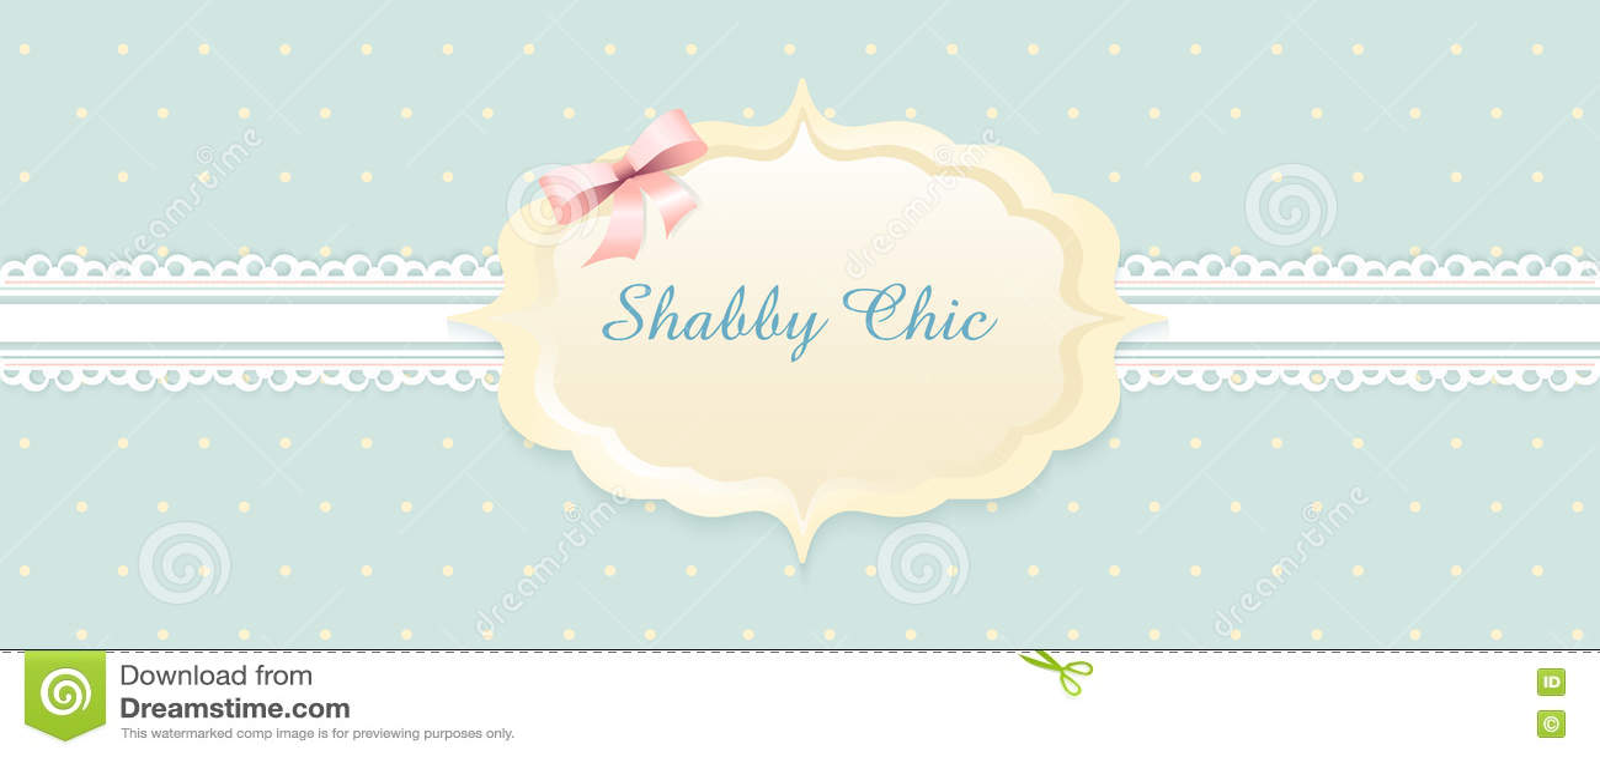 Shabby Chic. Congratulations Card. Classic Romantic Style. Stock ...